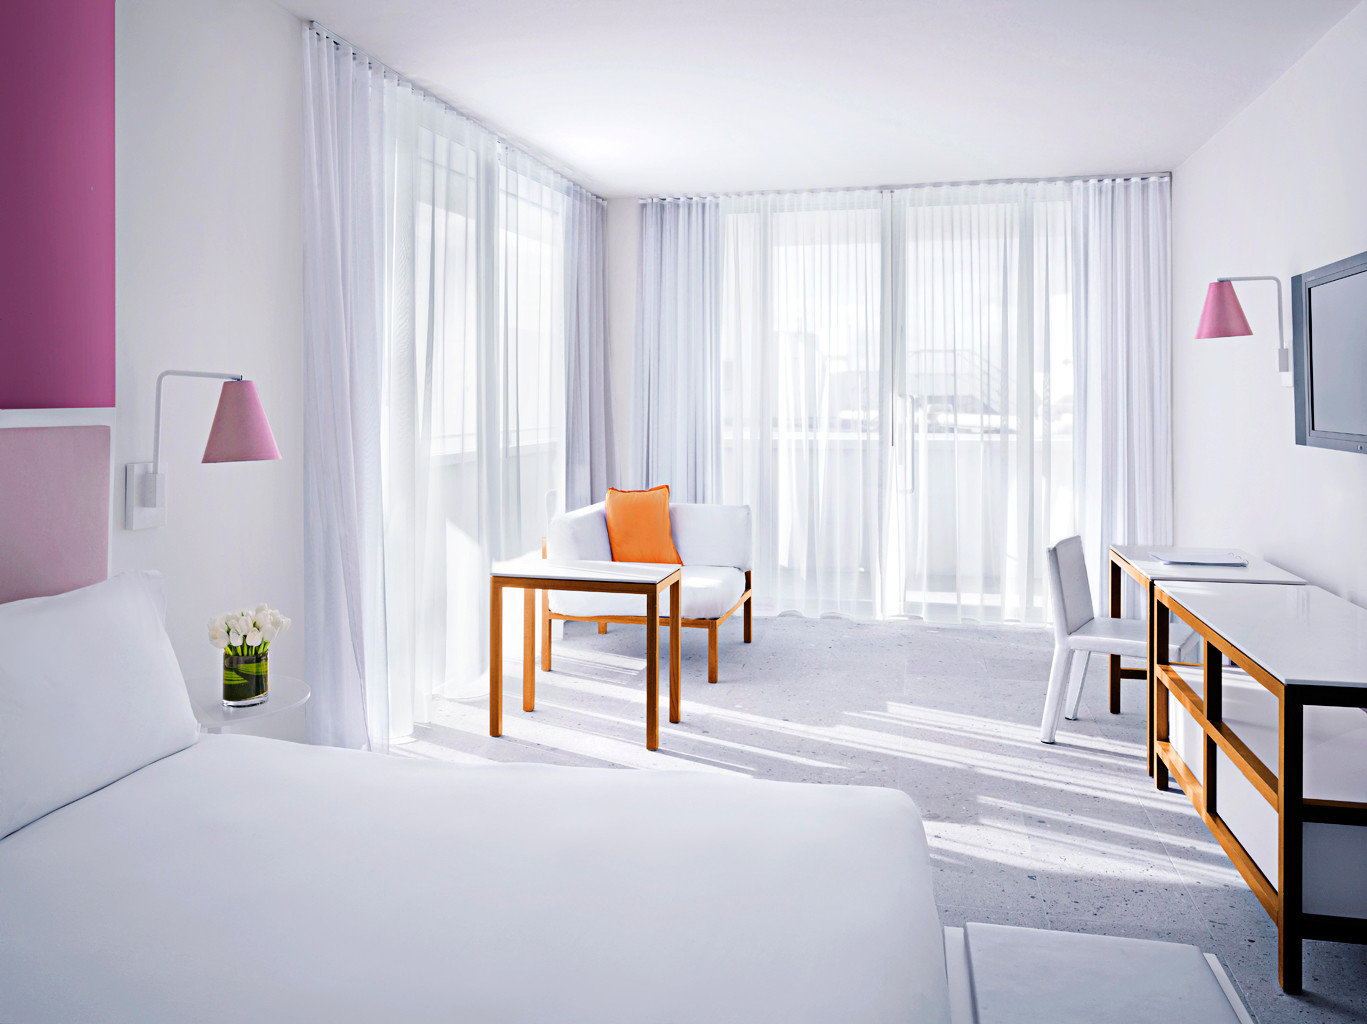 Beachfront Bedroom Classic Honeymoon Luxury Modern Nightlife Play Pool Resort Romance Waterfront property Suite white living room